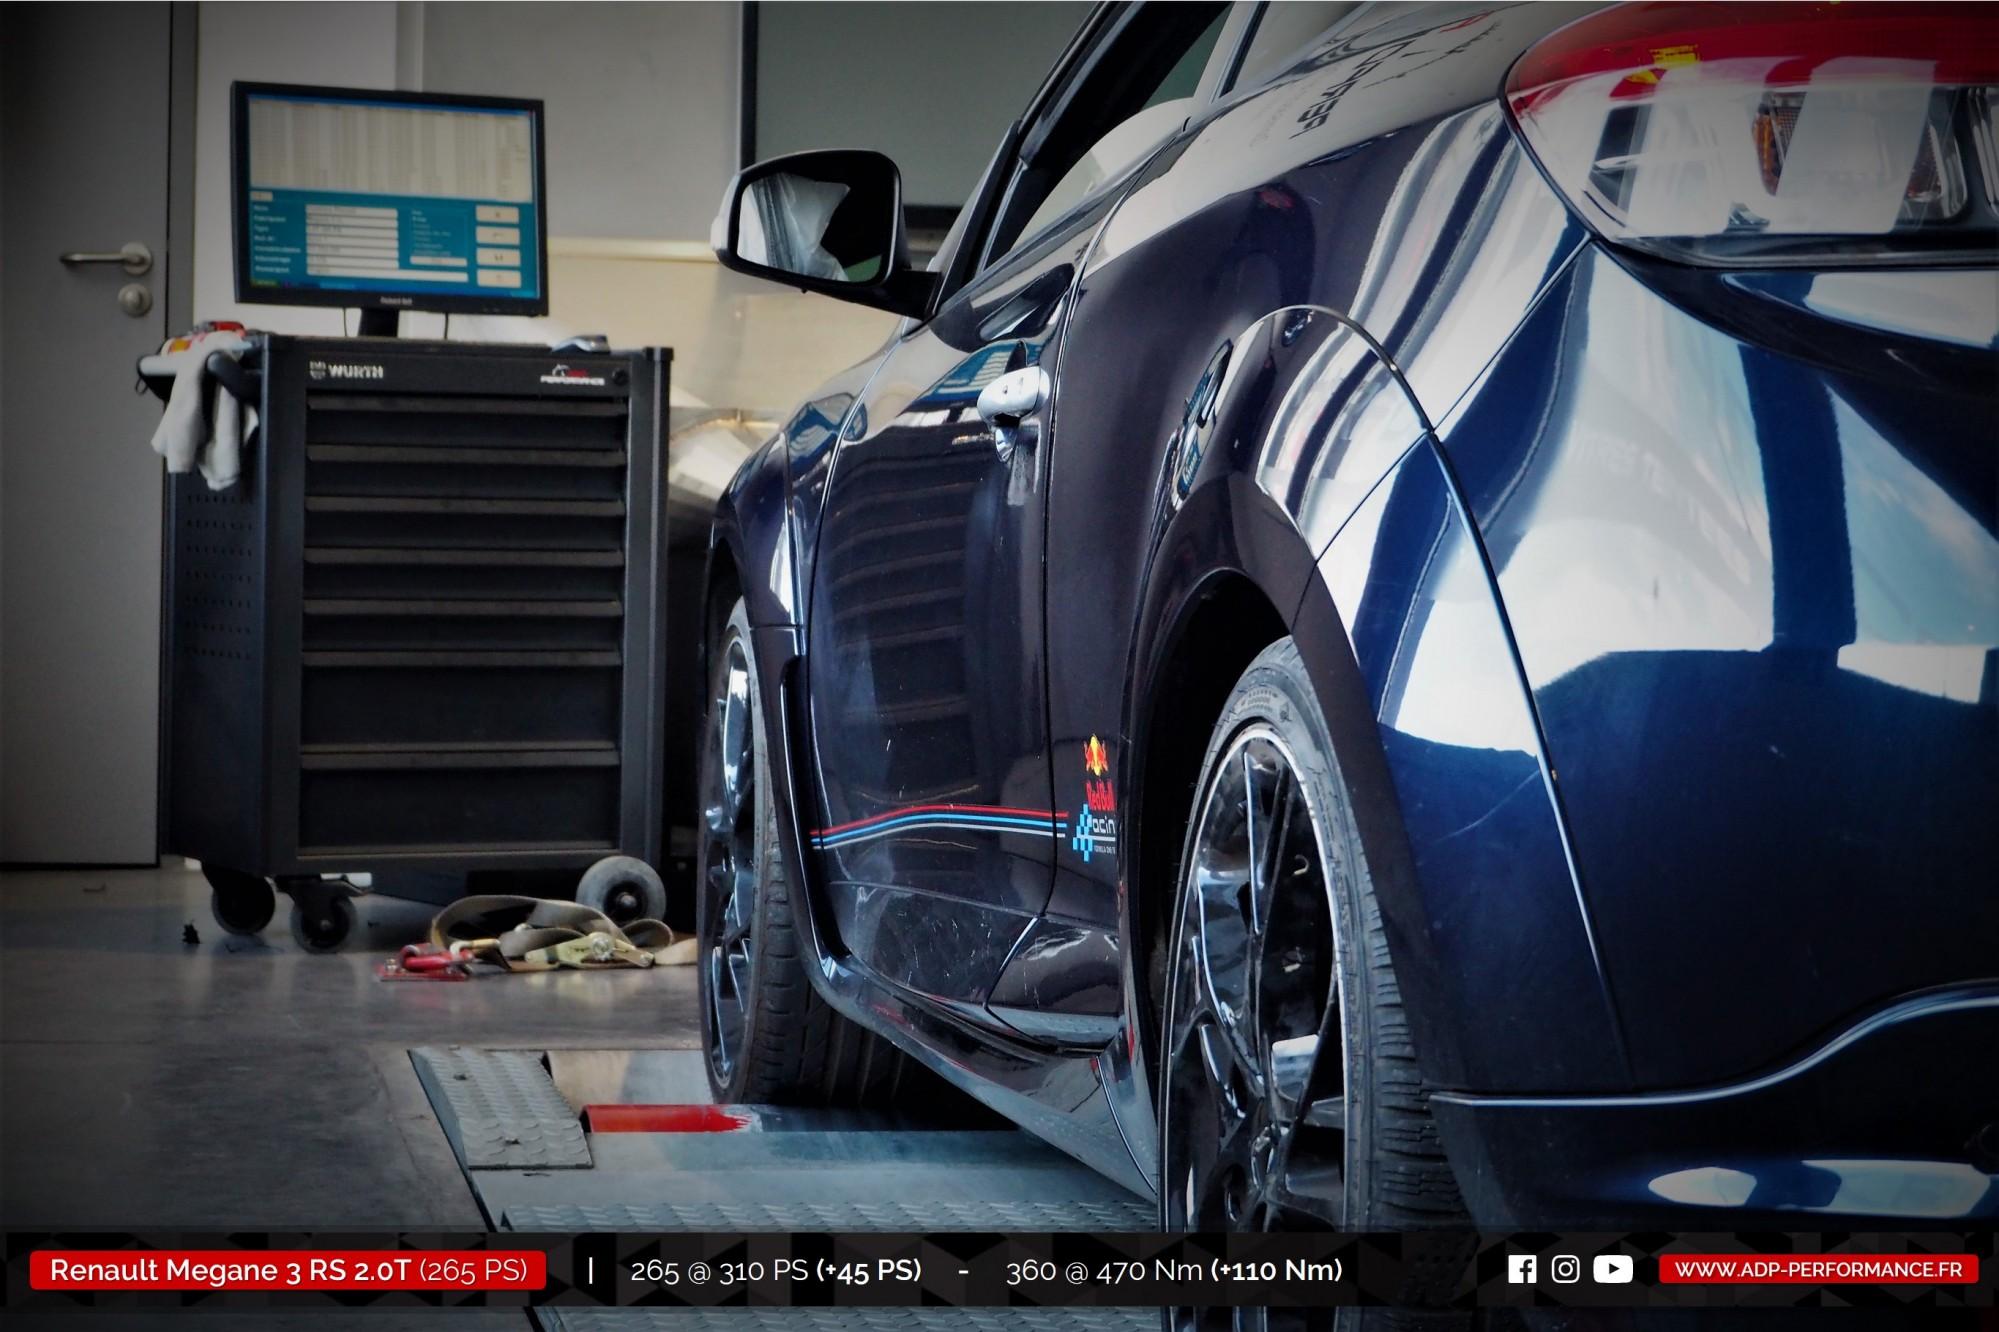 Reprogrammation moteur St Martin de Crau - Renault Megane 3 (Ph3) RS 2.0T 265cv - ADP Performance